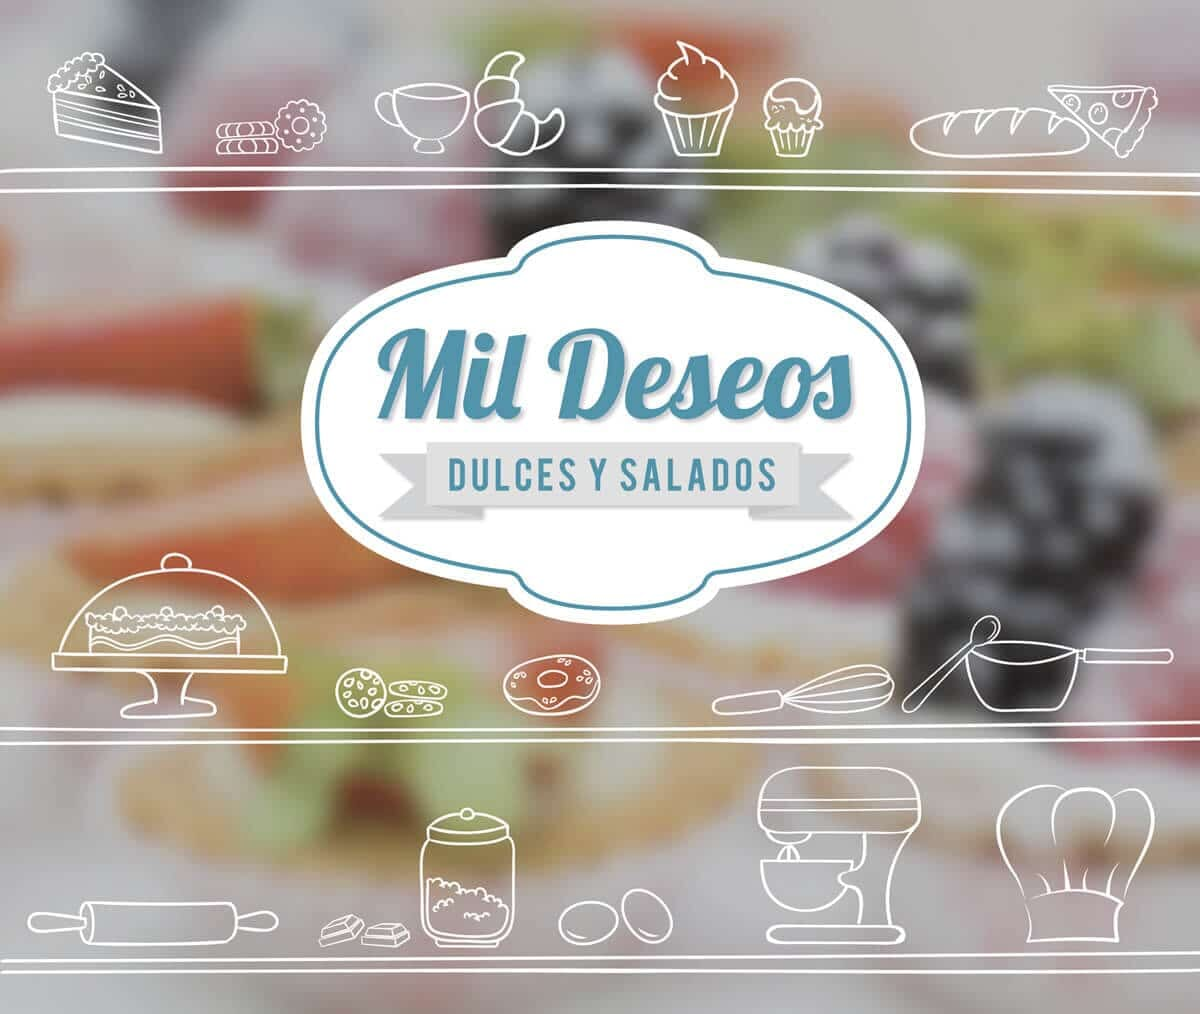 mildeseos2